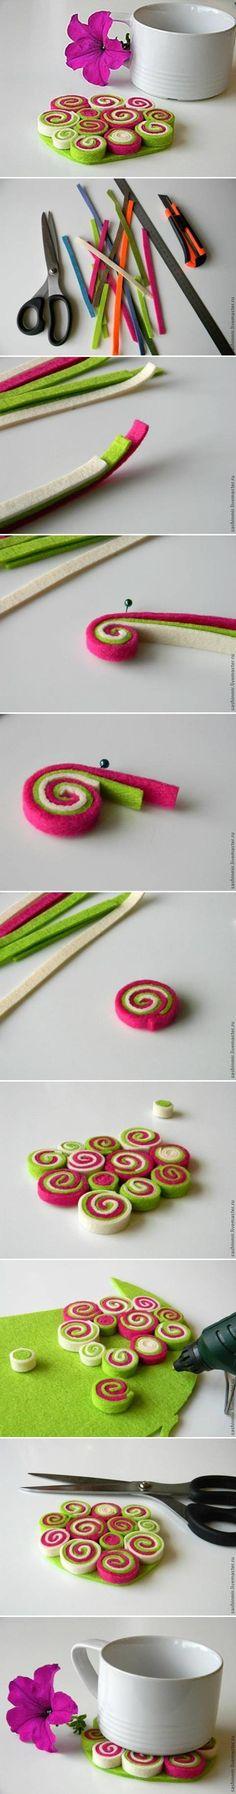 DIY Colorful Felt Coaster